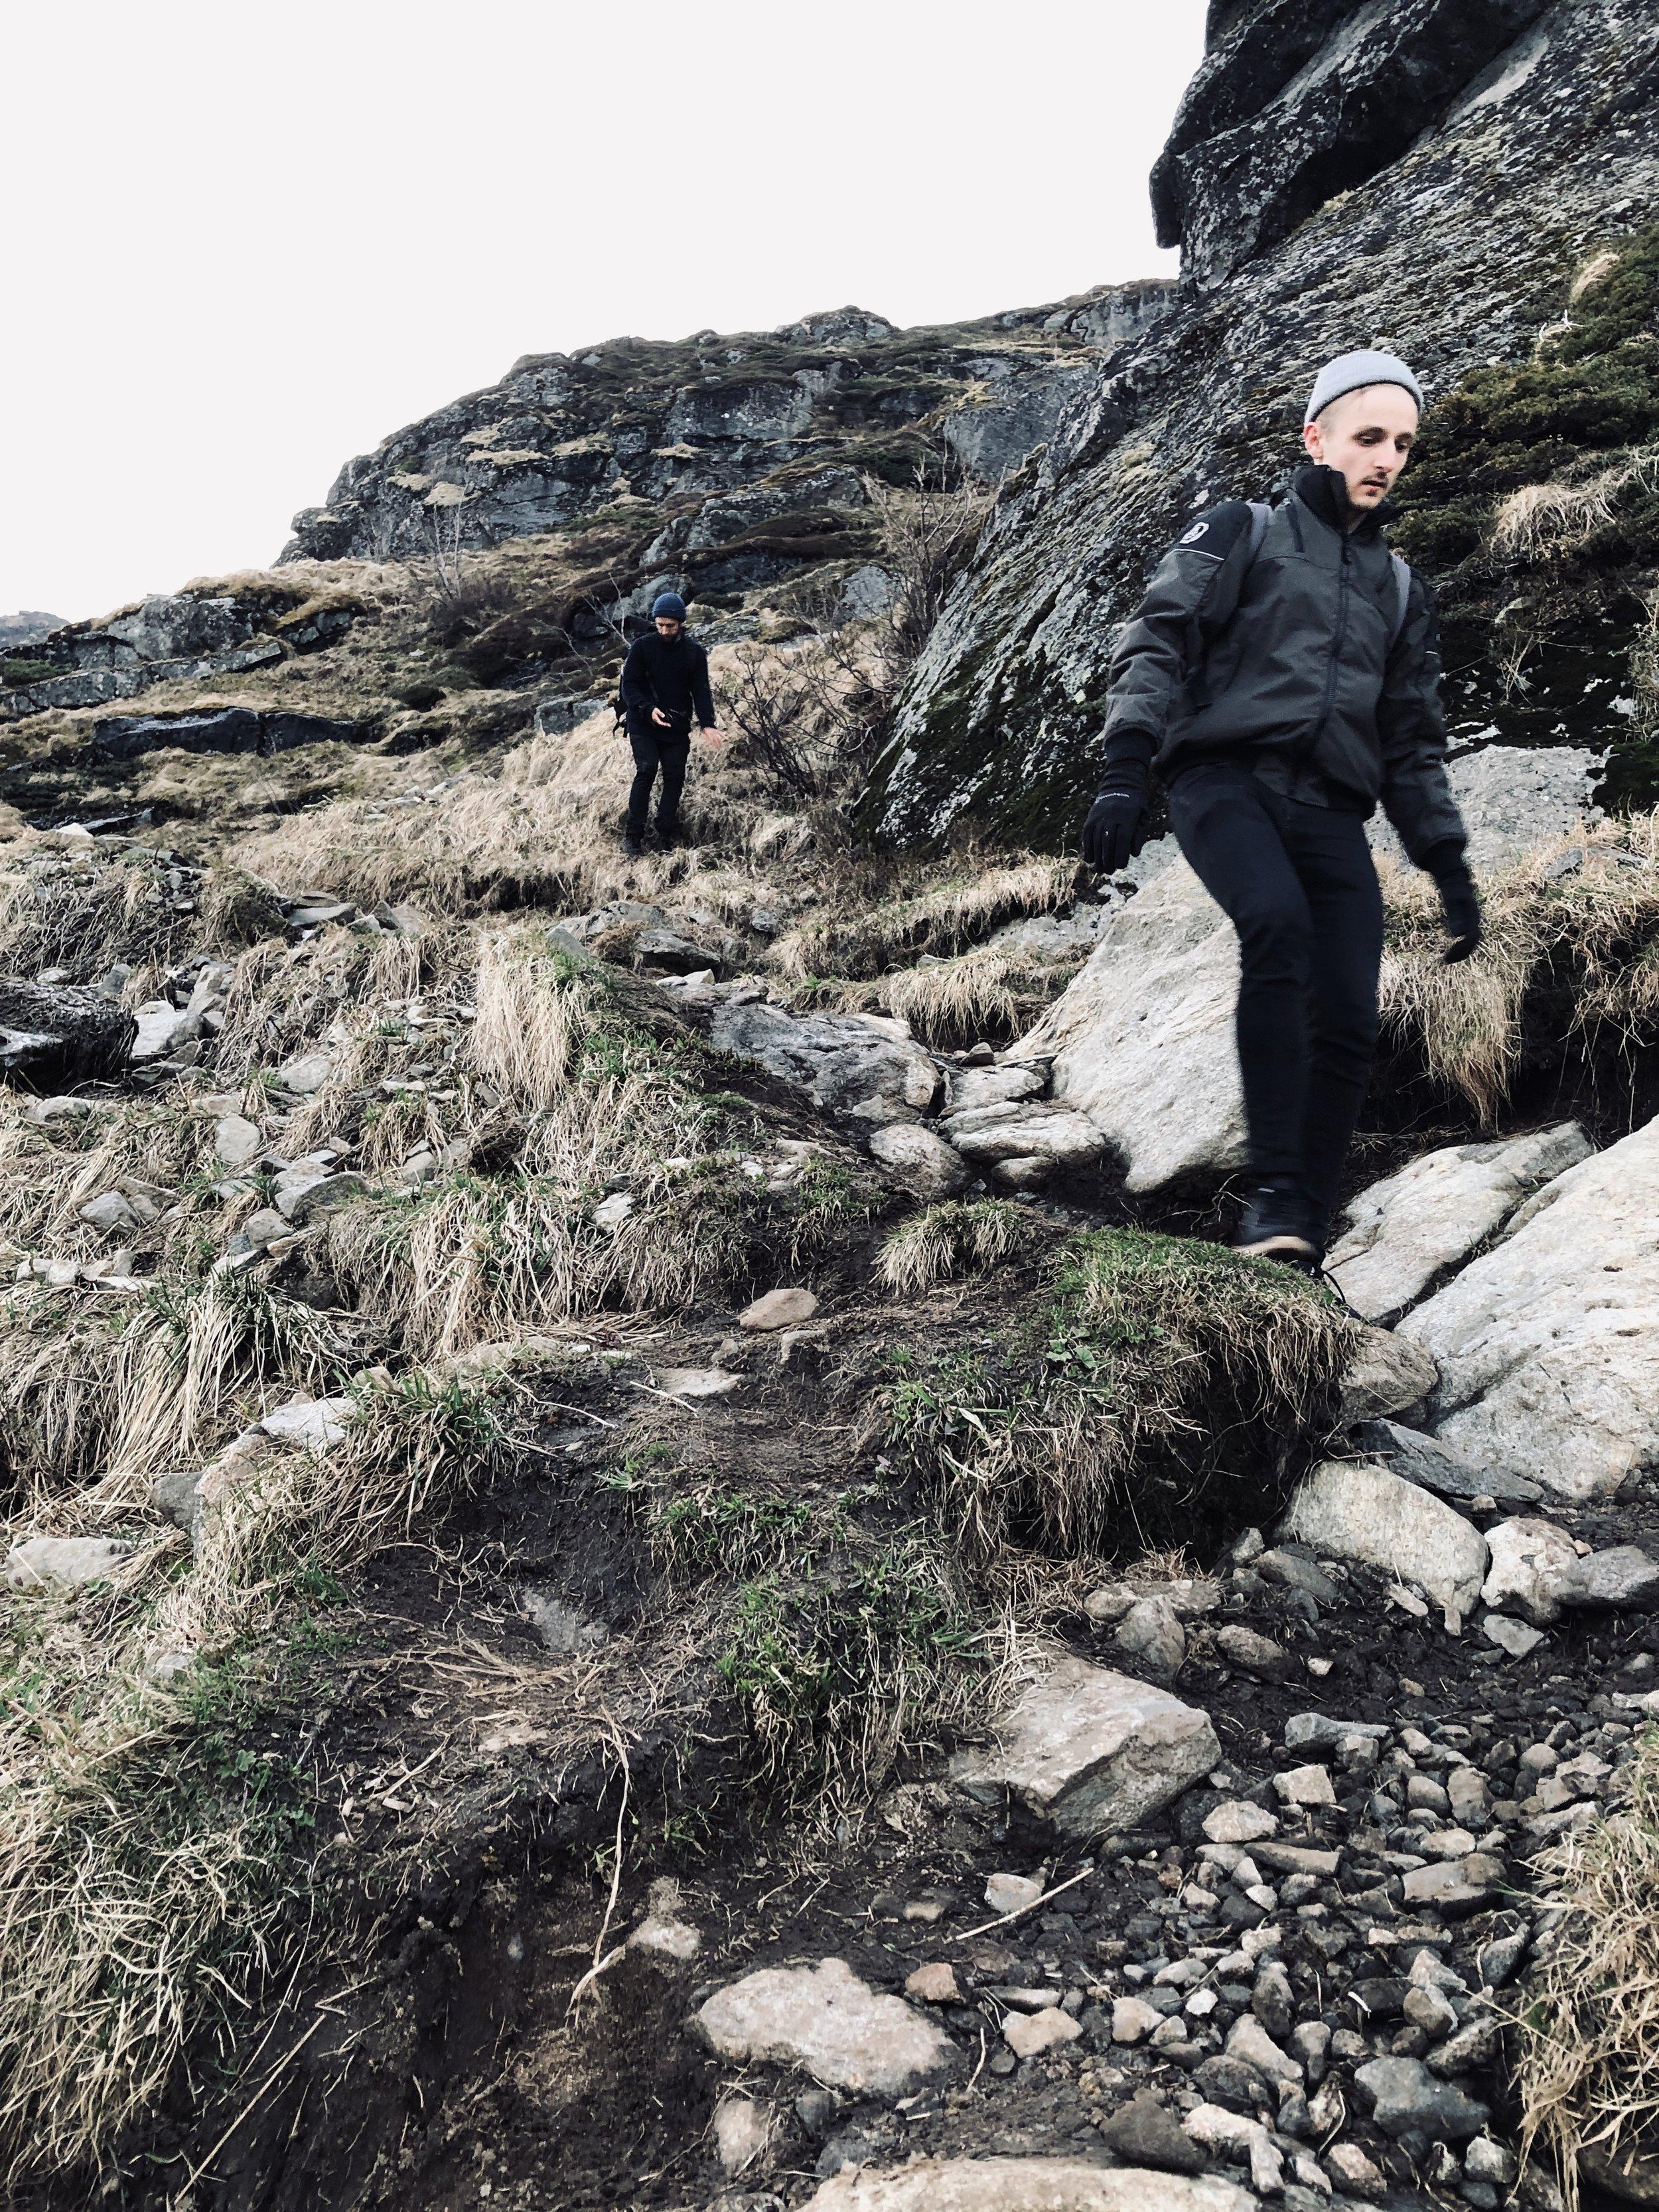 reinebringenreinebringen+lofoten+tips+hike